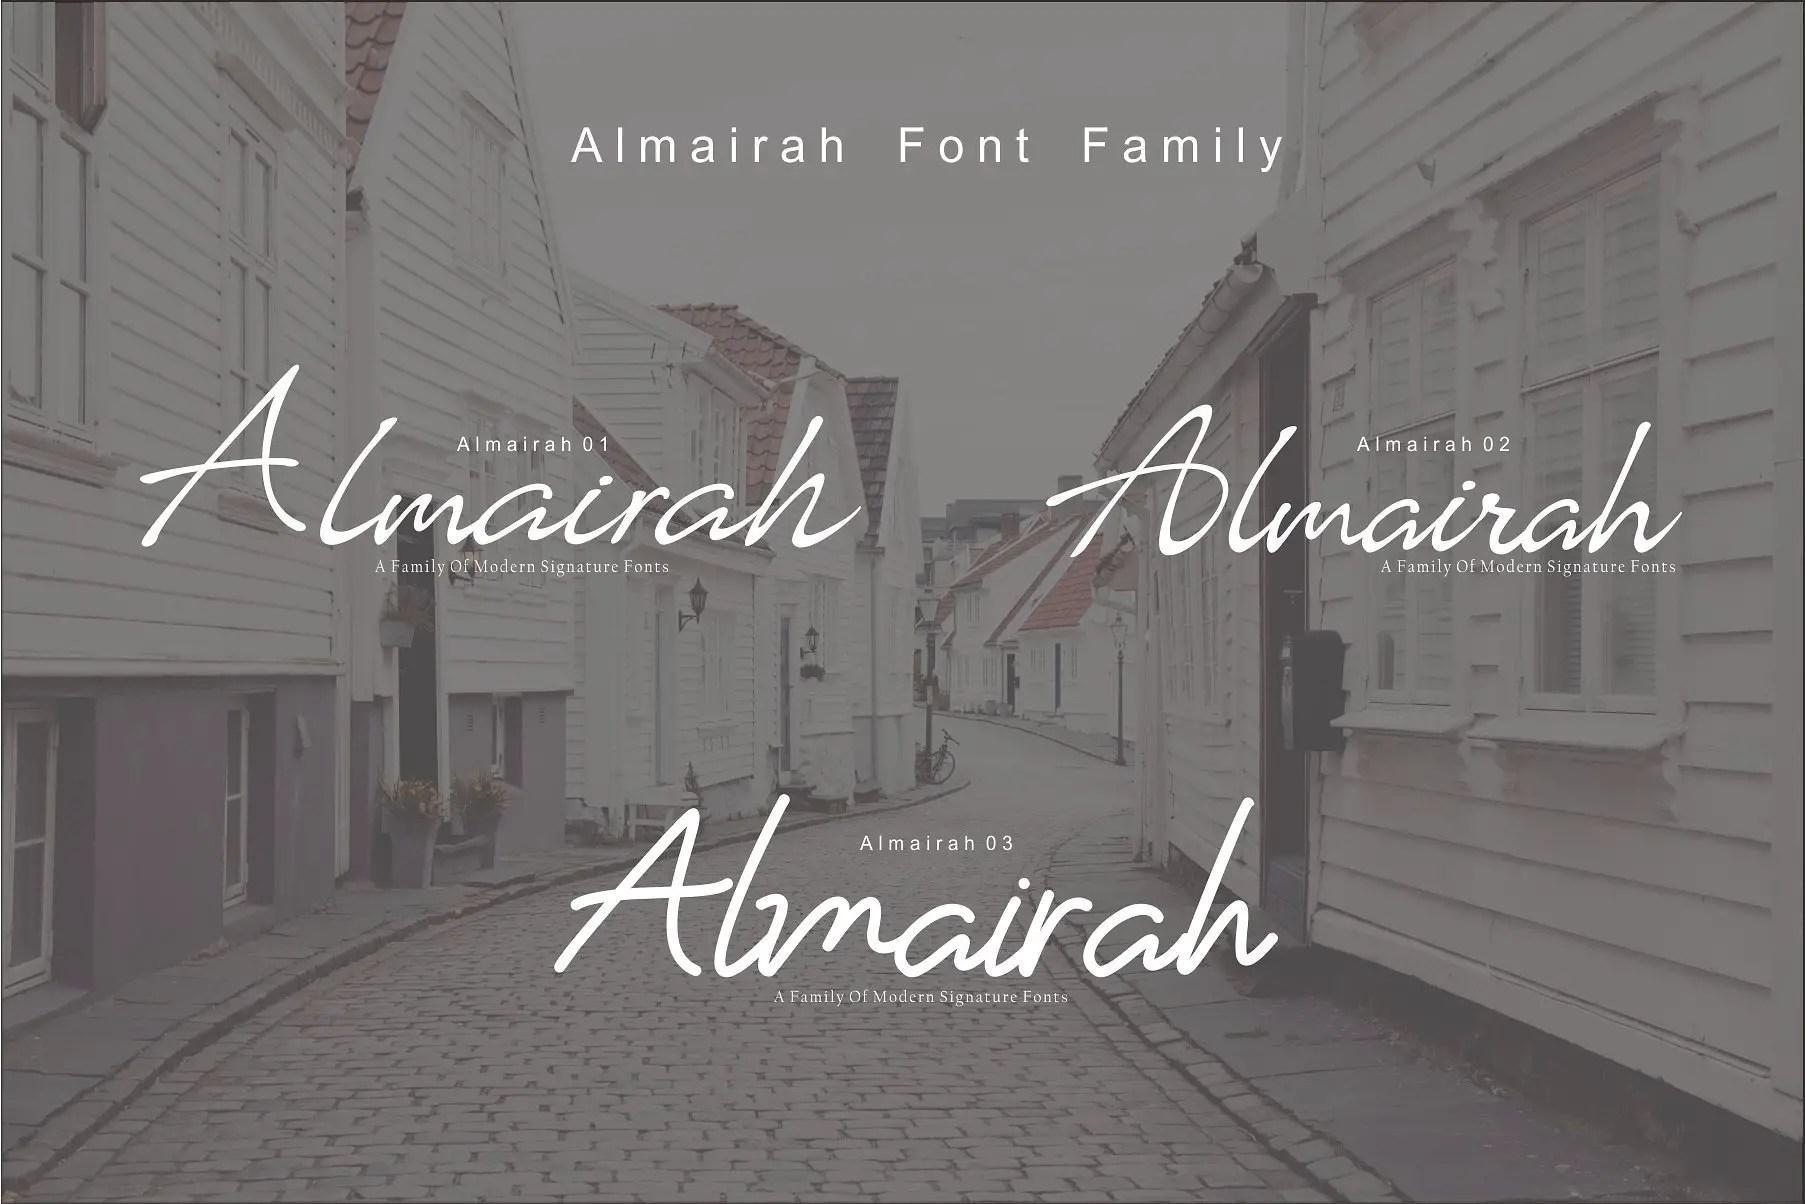 almairah-script-font-family.png